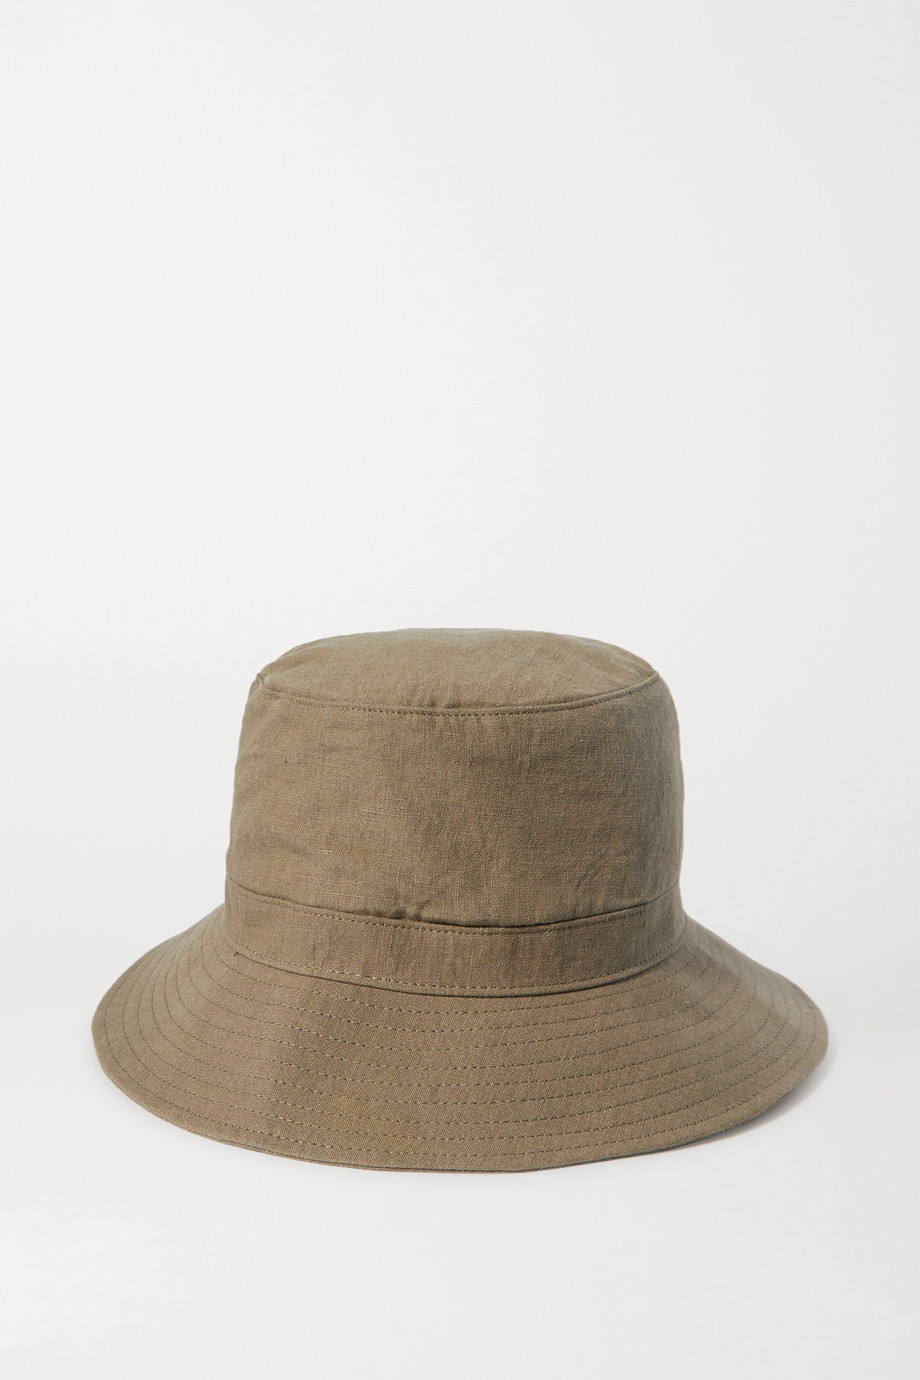 Bassike + Space For Giants linen bucket hat